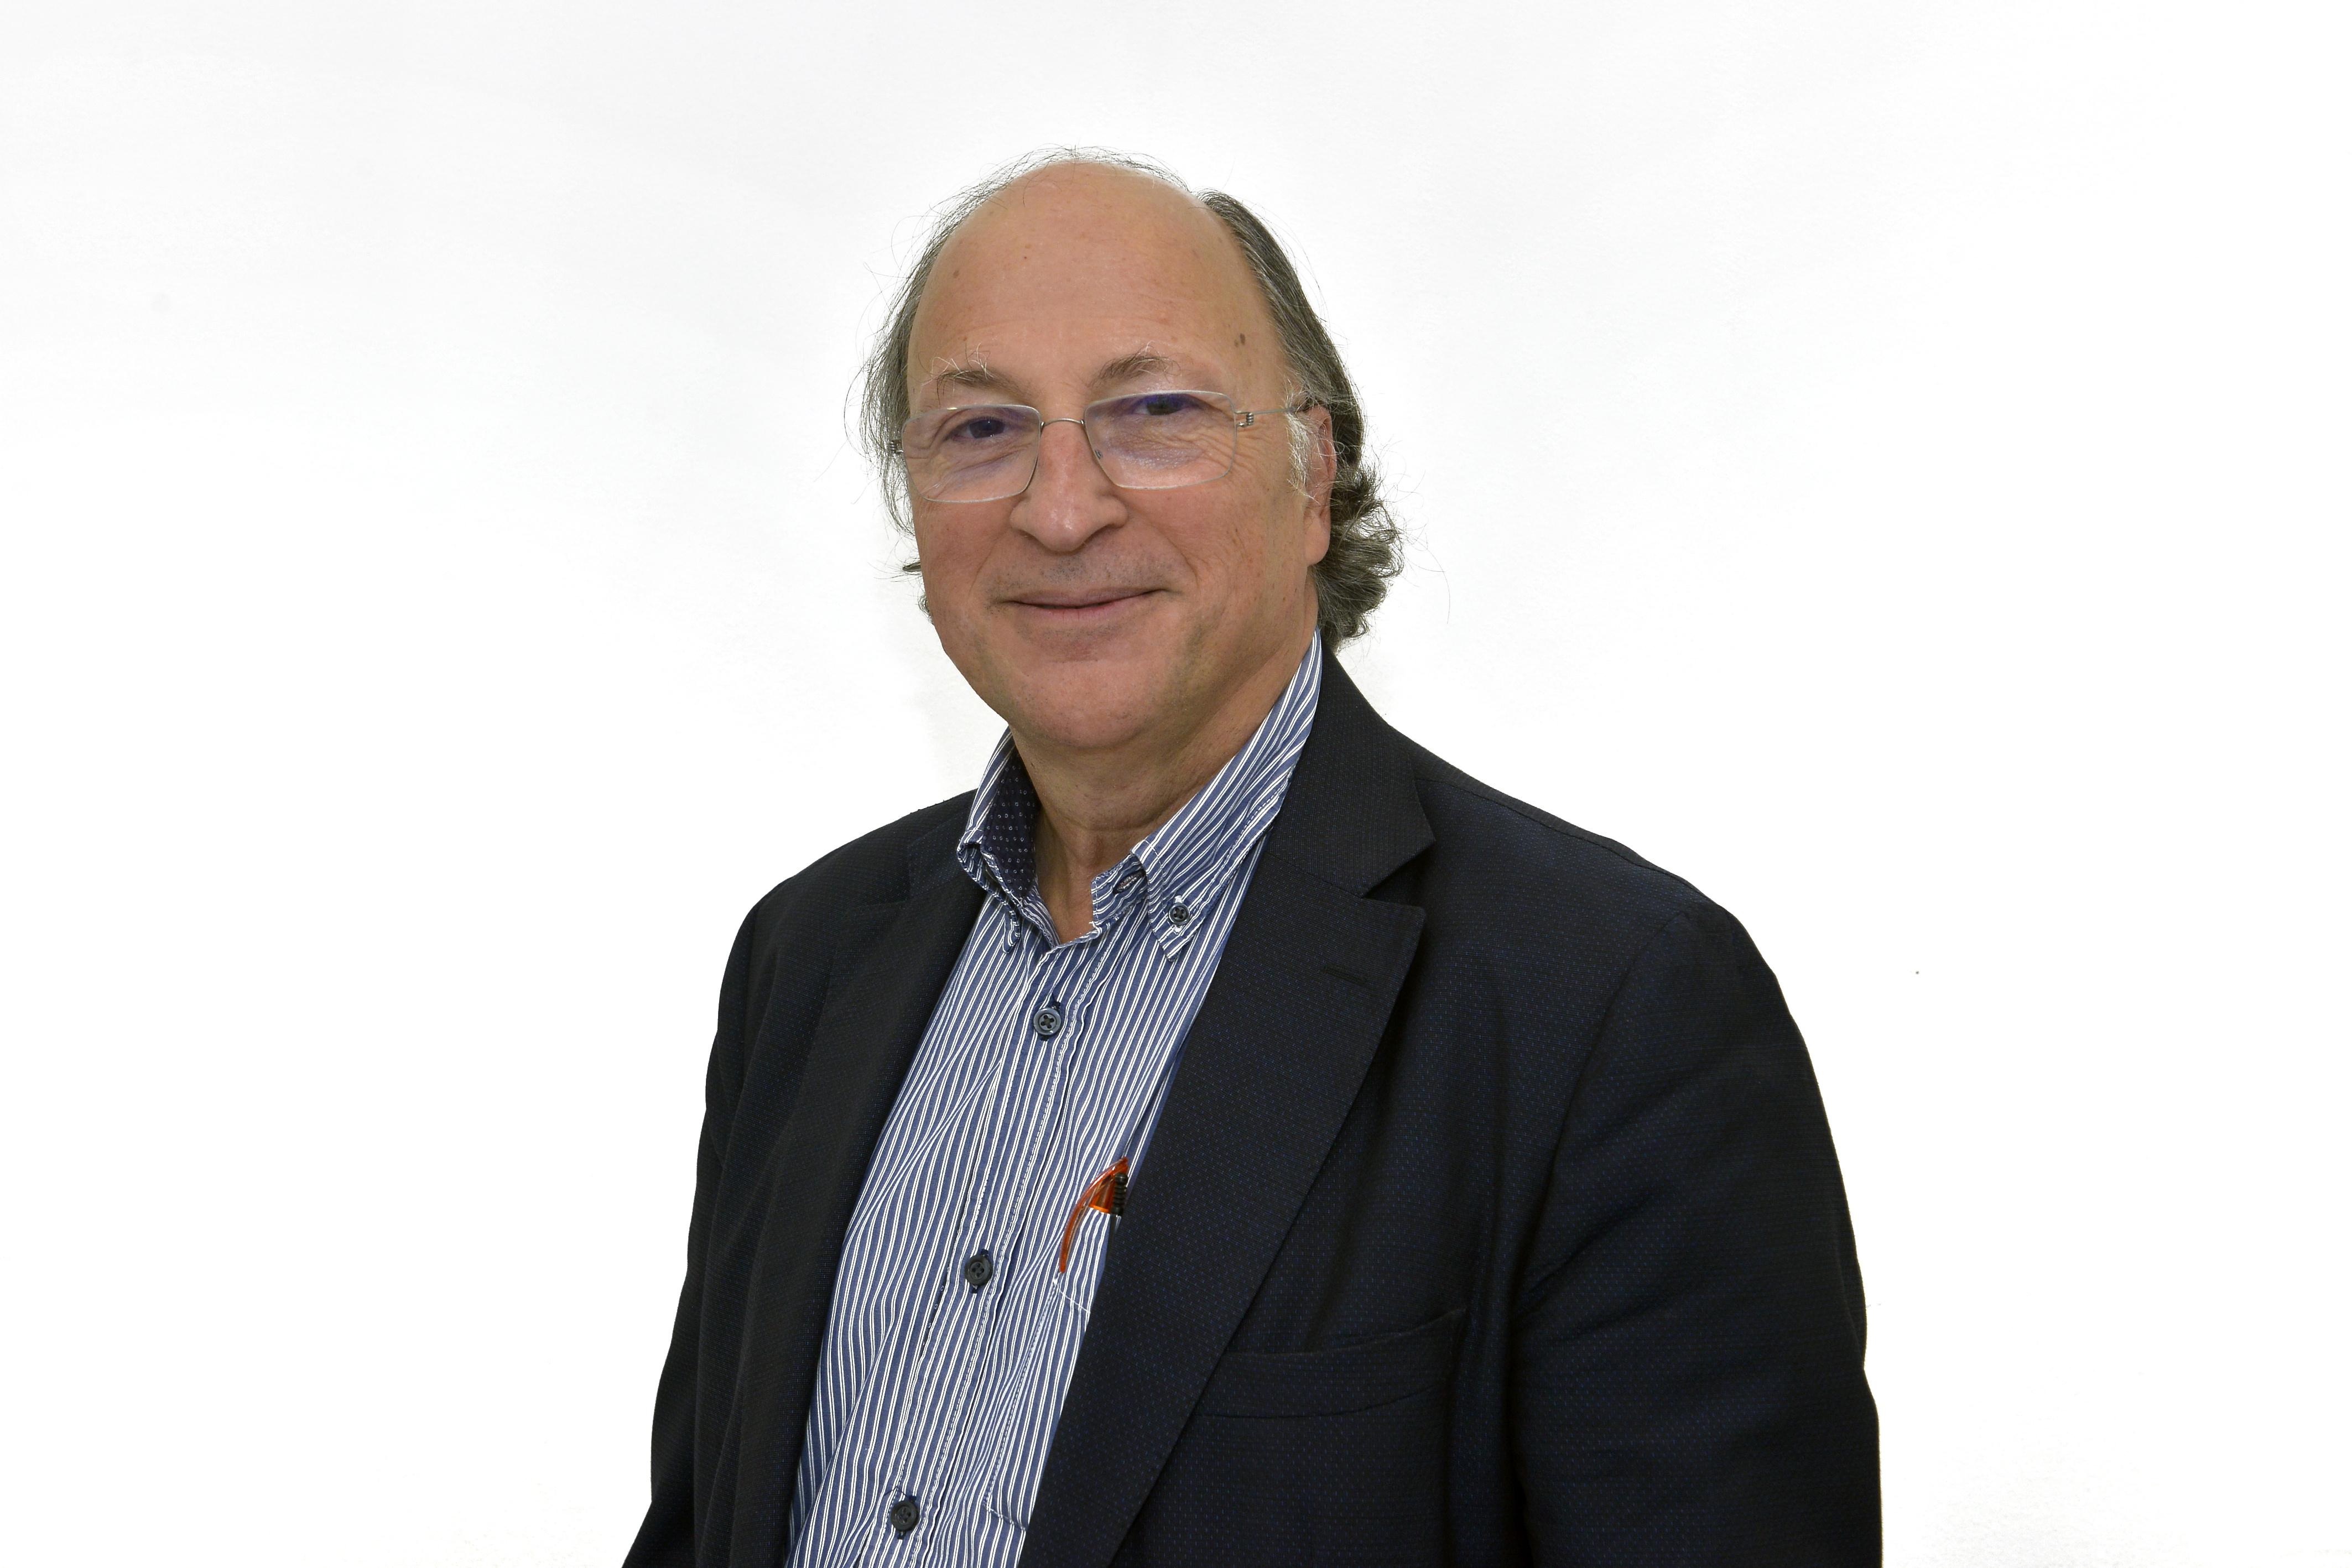 Juan Ramón Morante